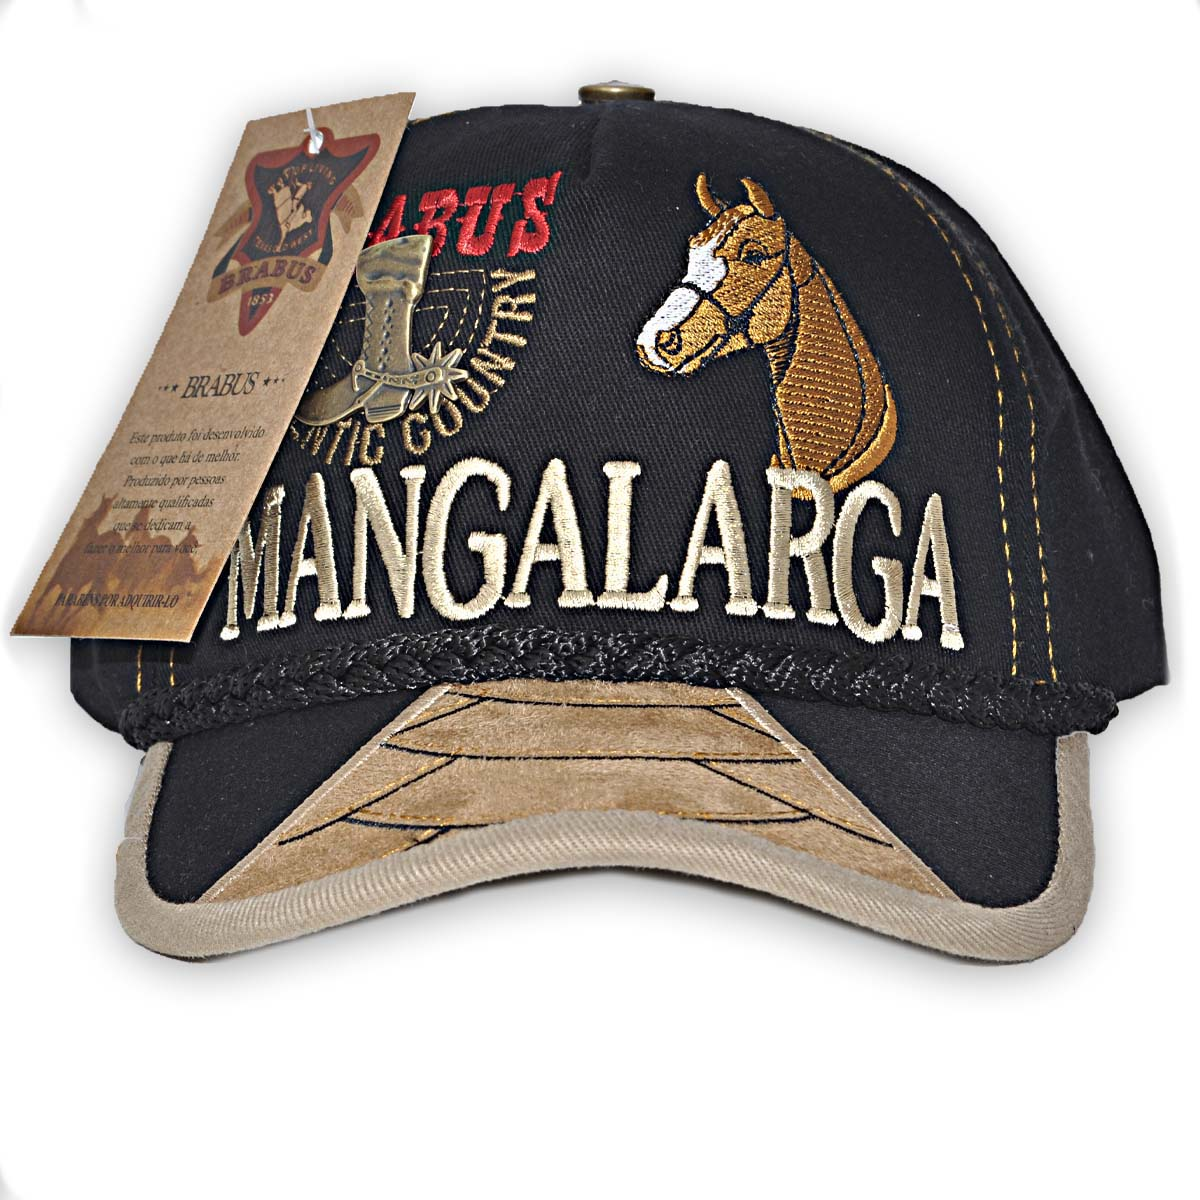 Boné Country Brabus - Mangalarga 2 - Preto